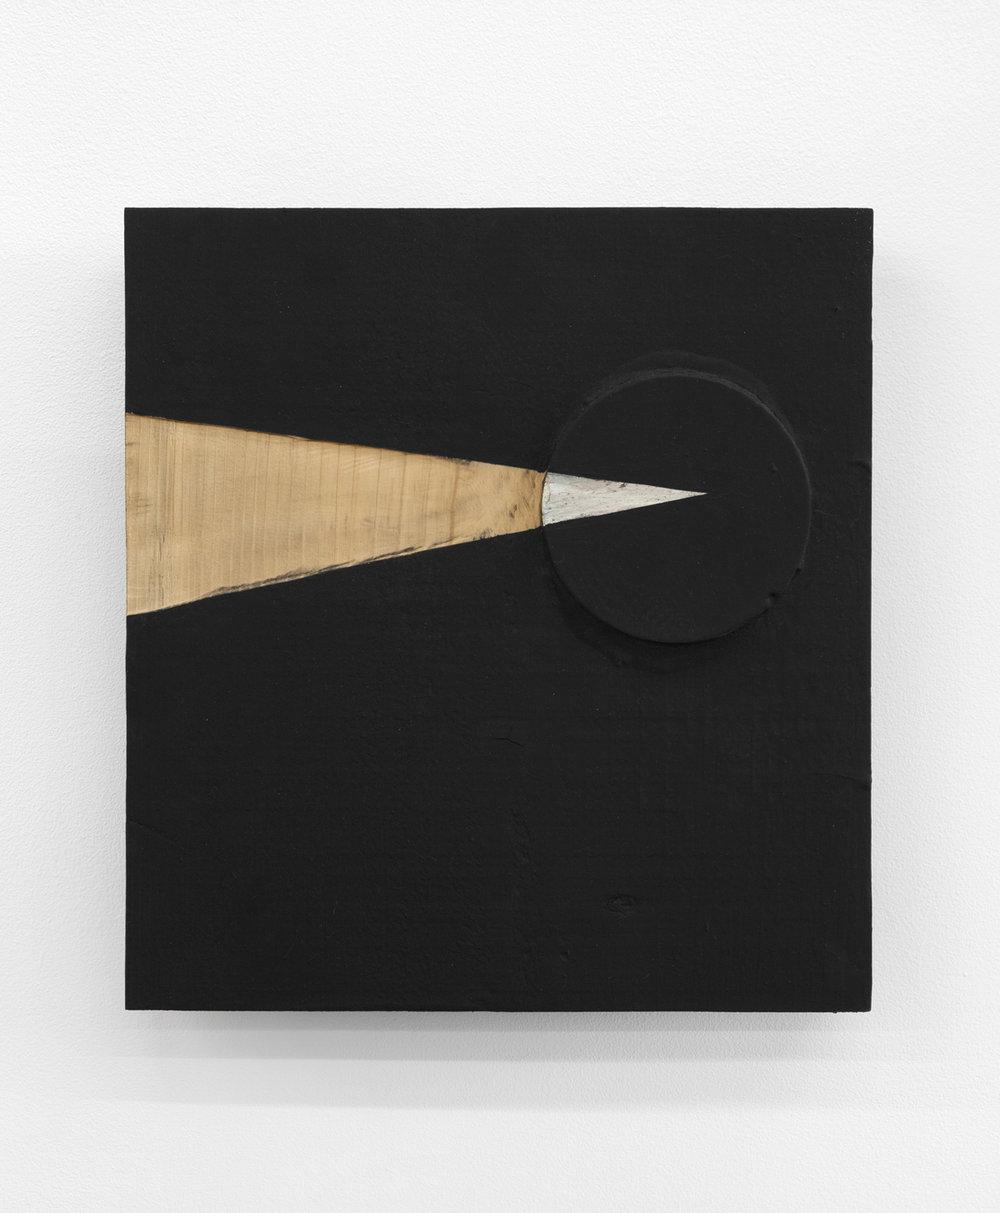 Order of Transparency , 2005 透構律 ( Tōkōritsu ) Wood, steel, water-based paint 11 7/8 x 11 x 2 1/2 inches 30 x 28 x 6.5 cm